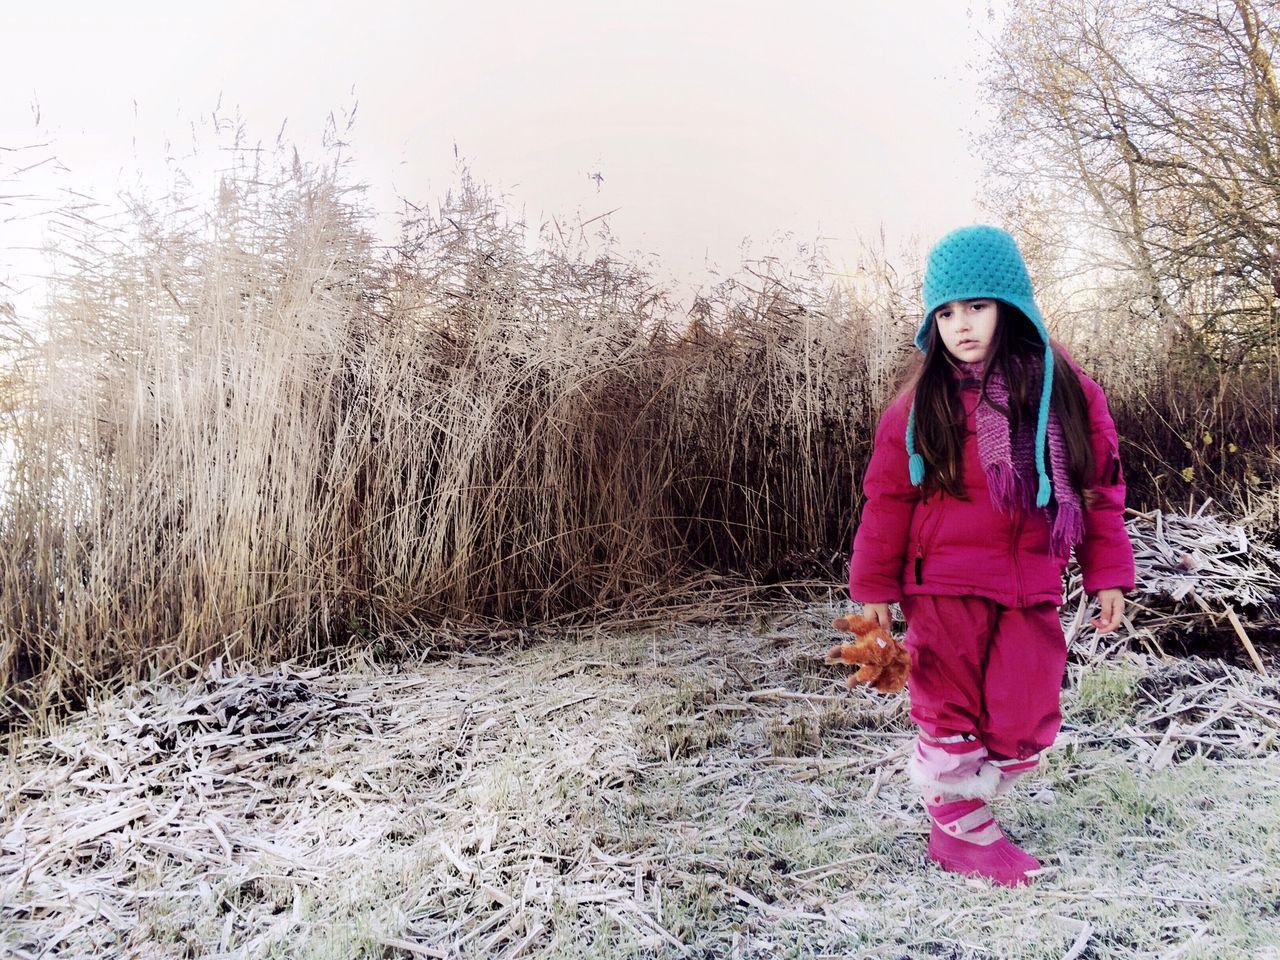 Full length of girl holding teddy bear and walking on grassy field